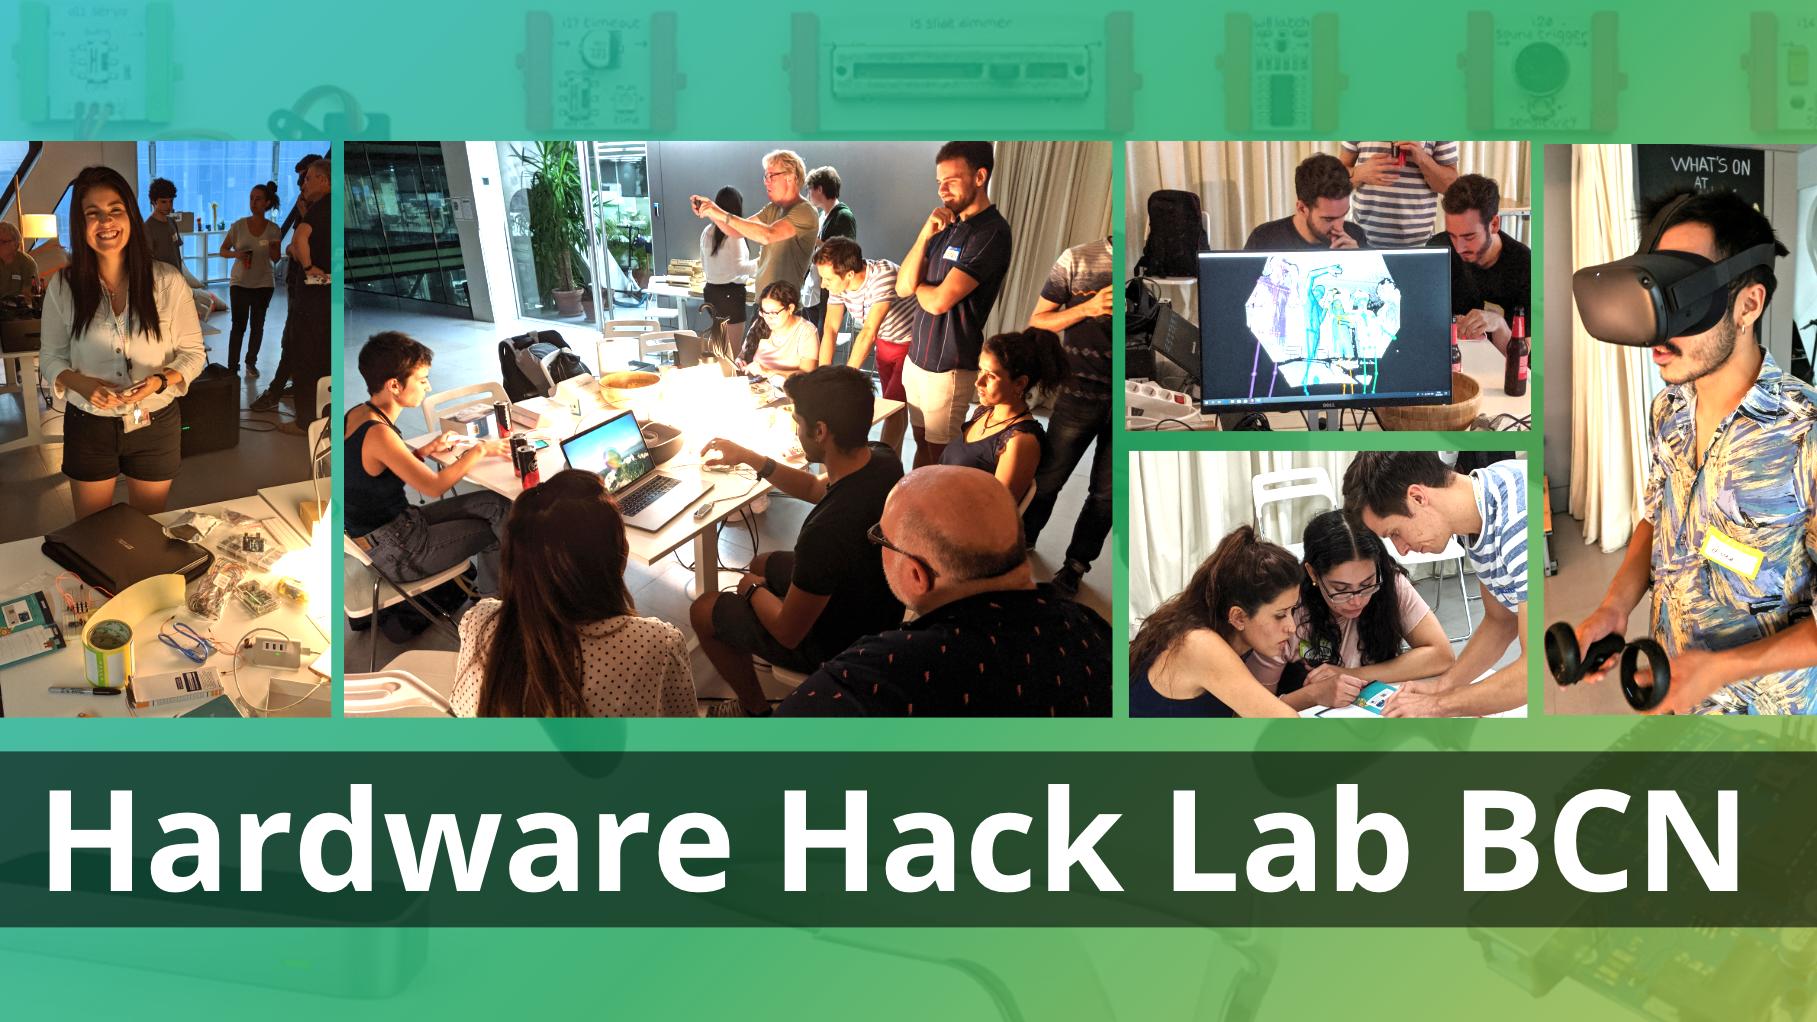 Hardware Hack Lab BCN